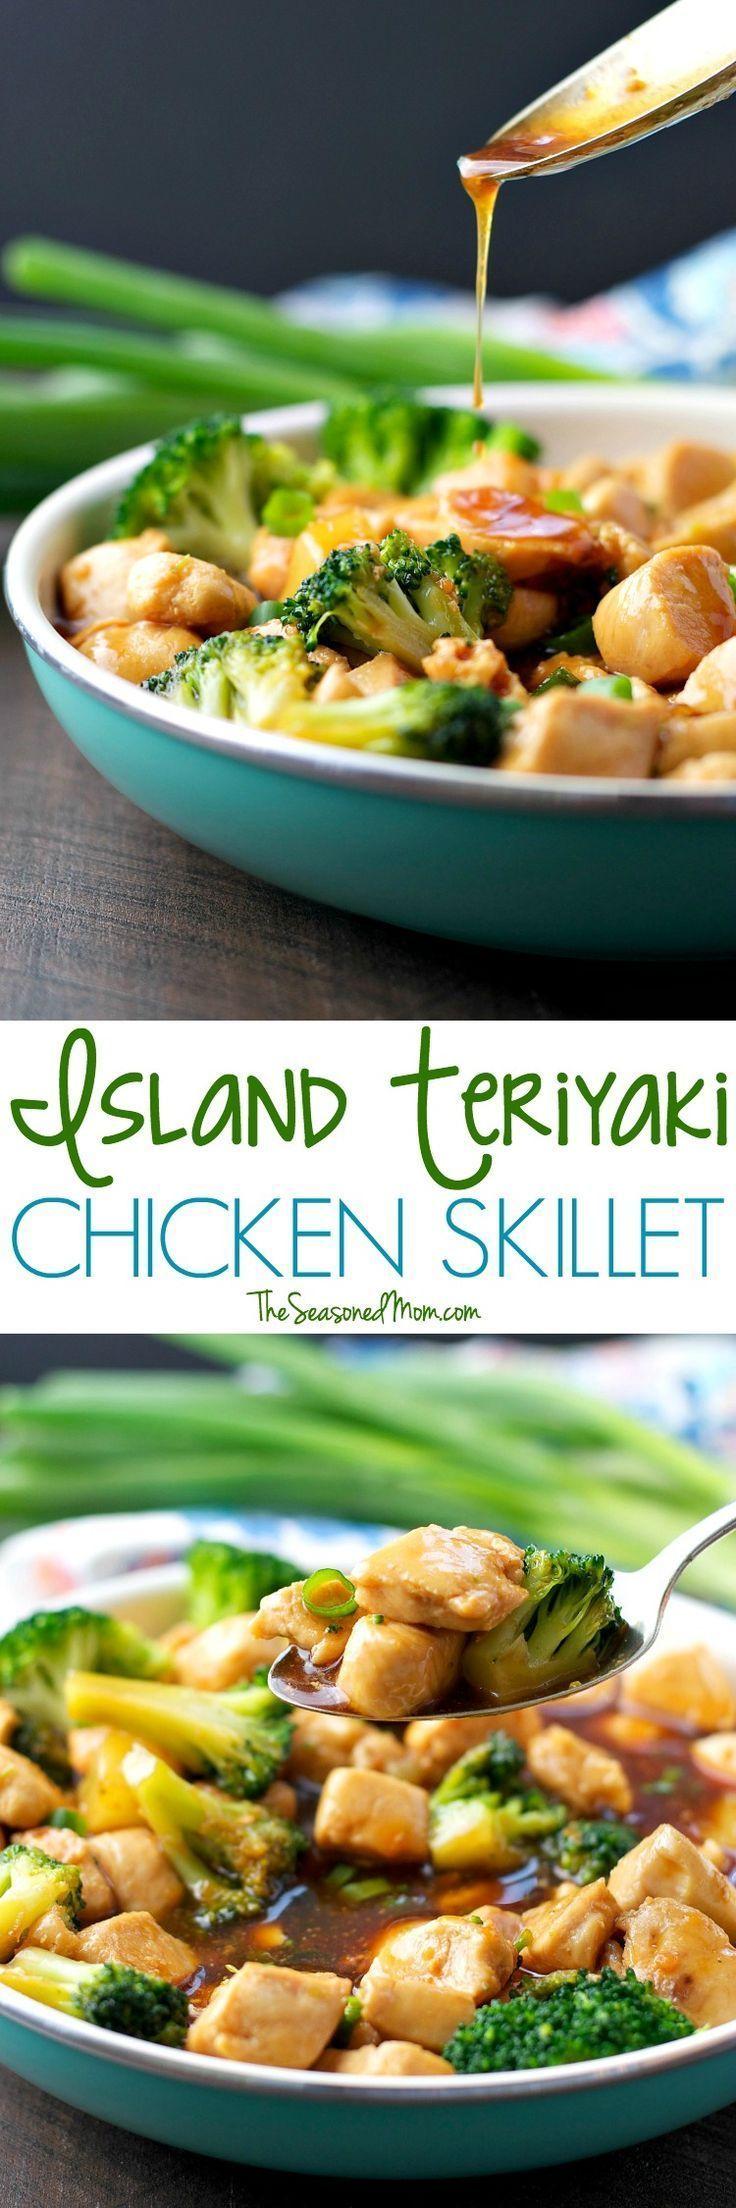 Whole Foods Teriyaki Chicken Bowl Calories